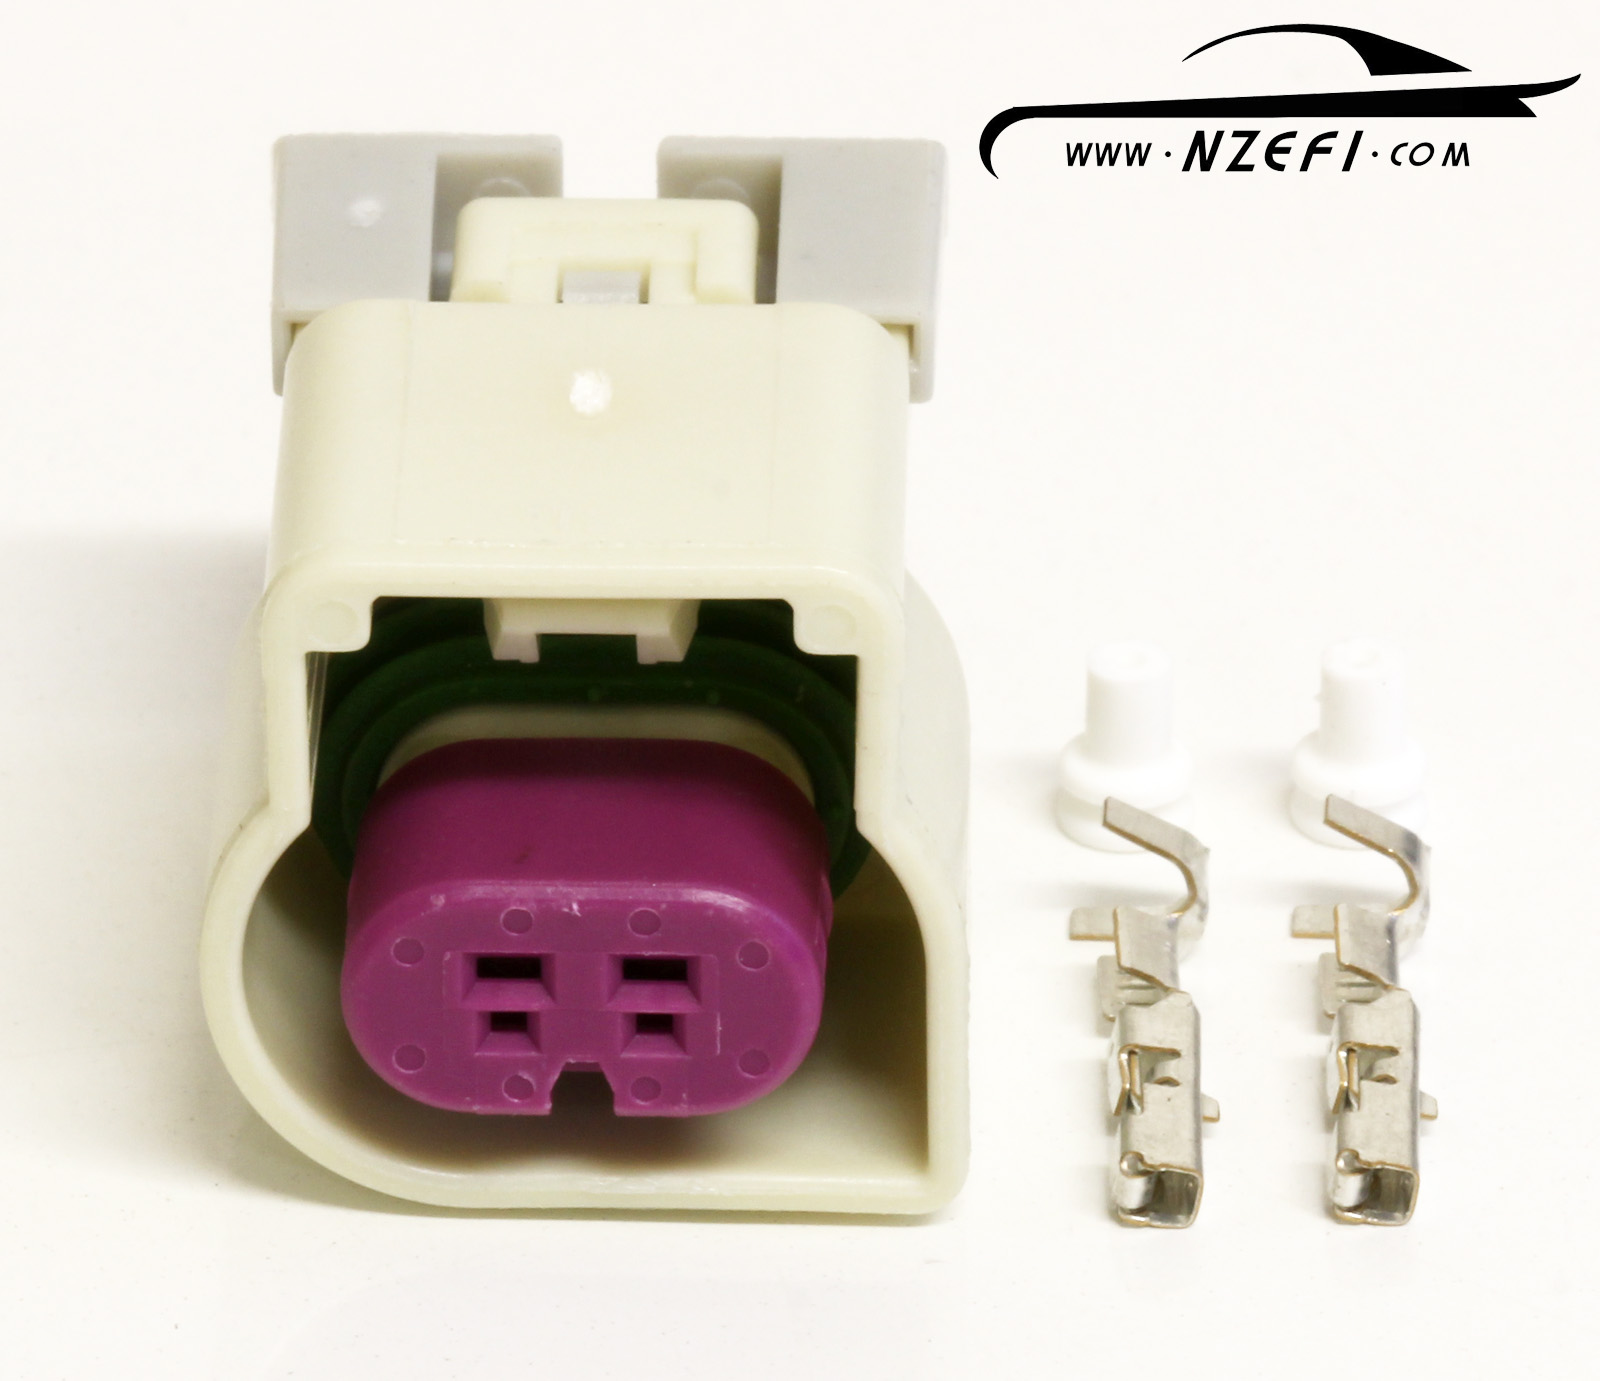 Gm Knock Sensor Connector Ls2 Ls3 Ls7 Etc Nzefi Wiring Harness